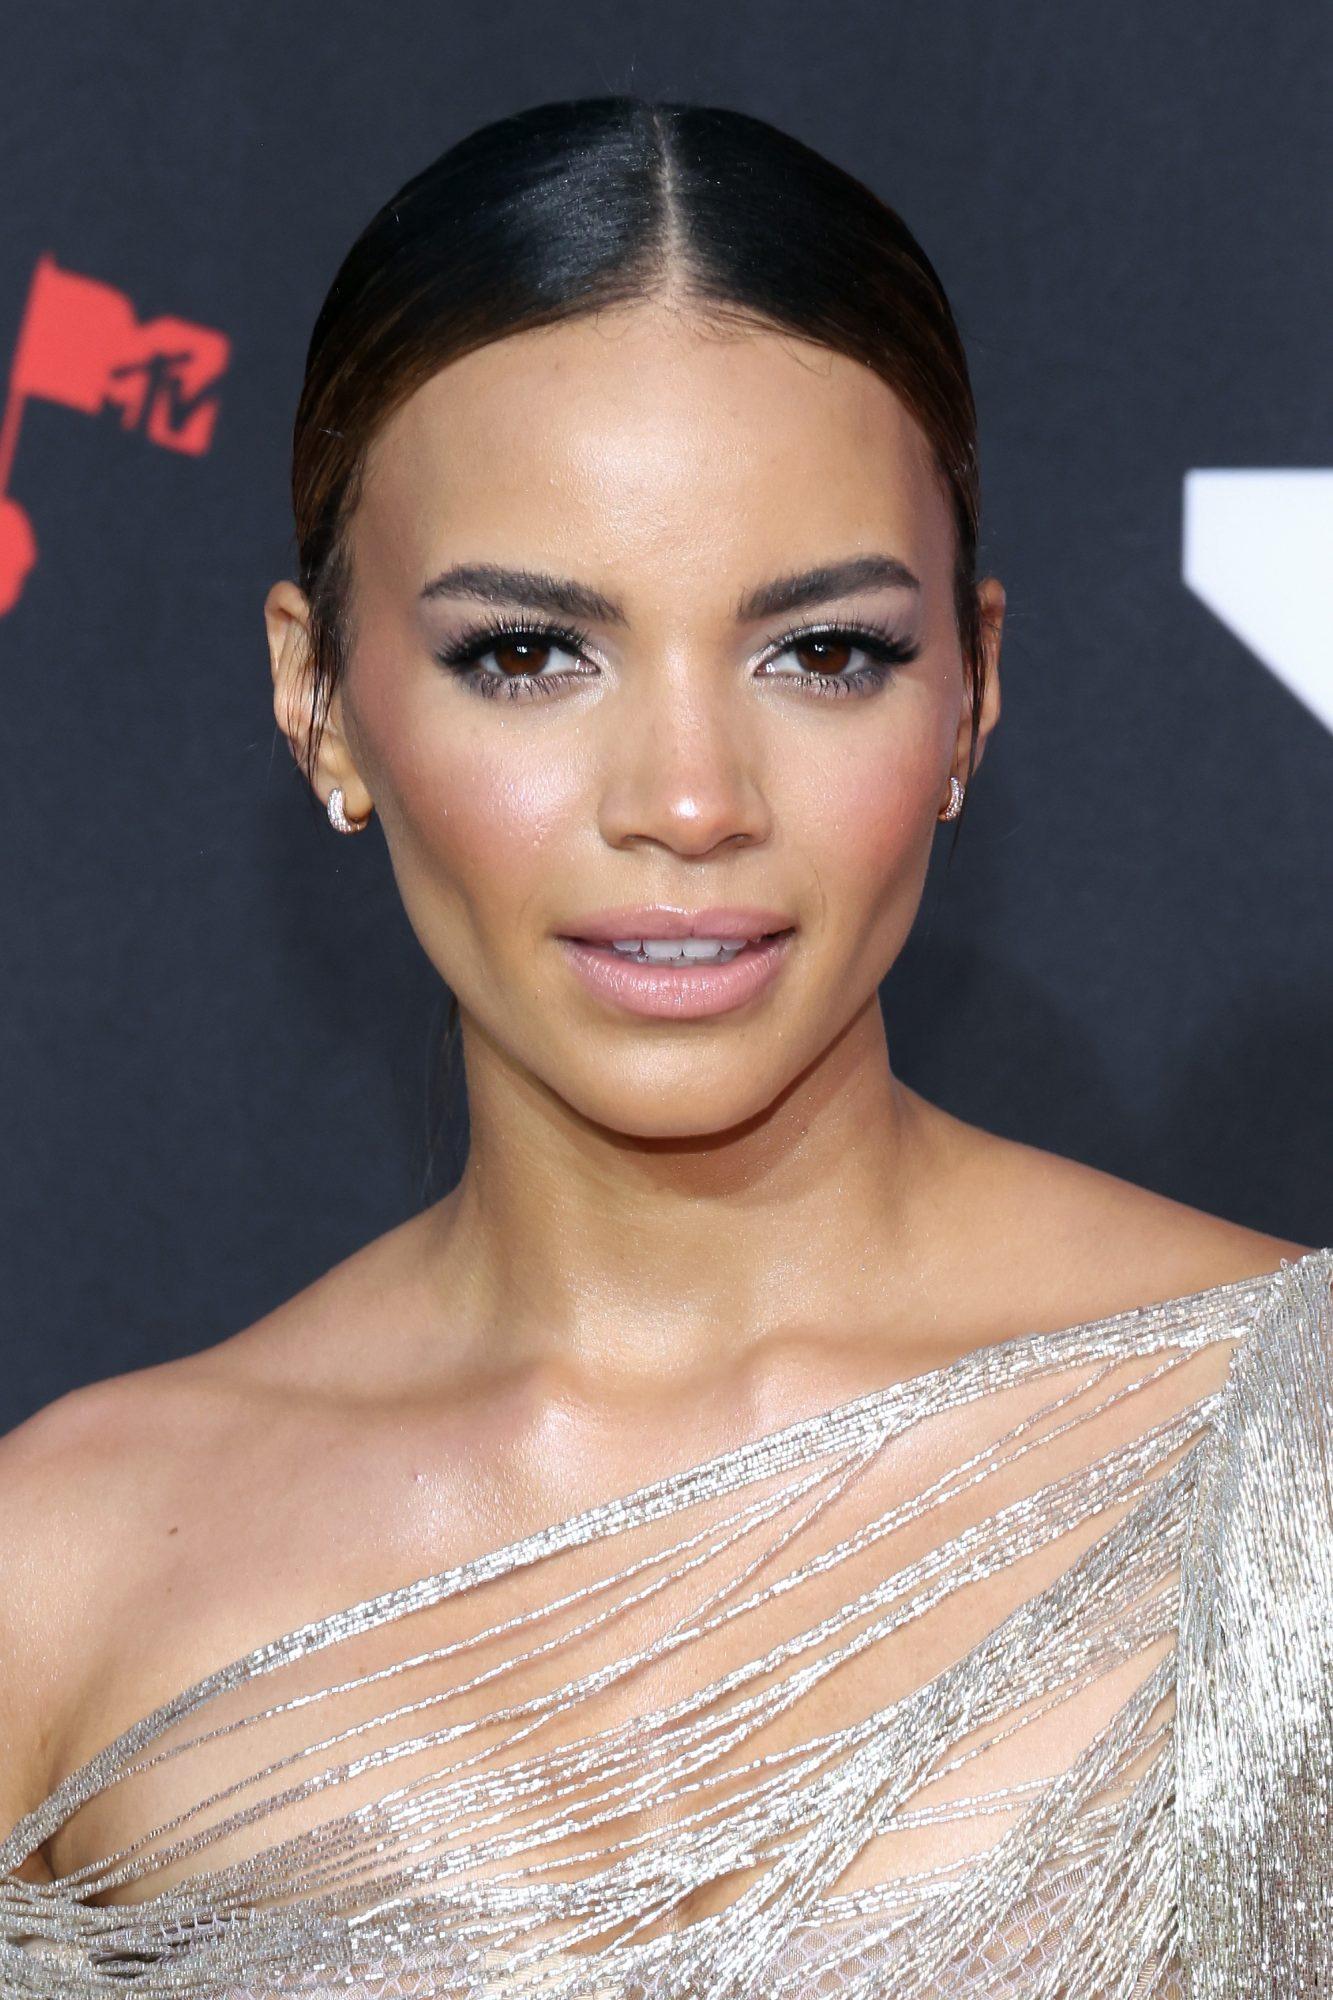 MTV VMA looks del belleza, Leslie Grace